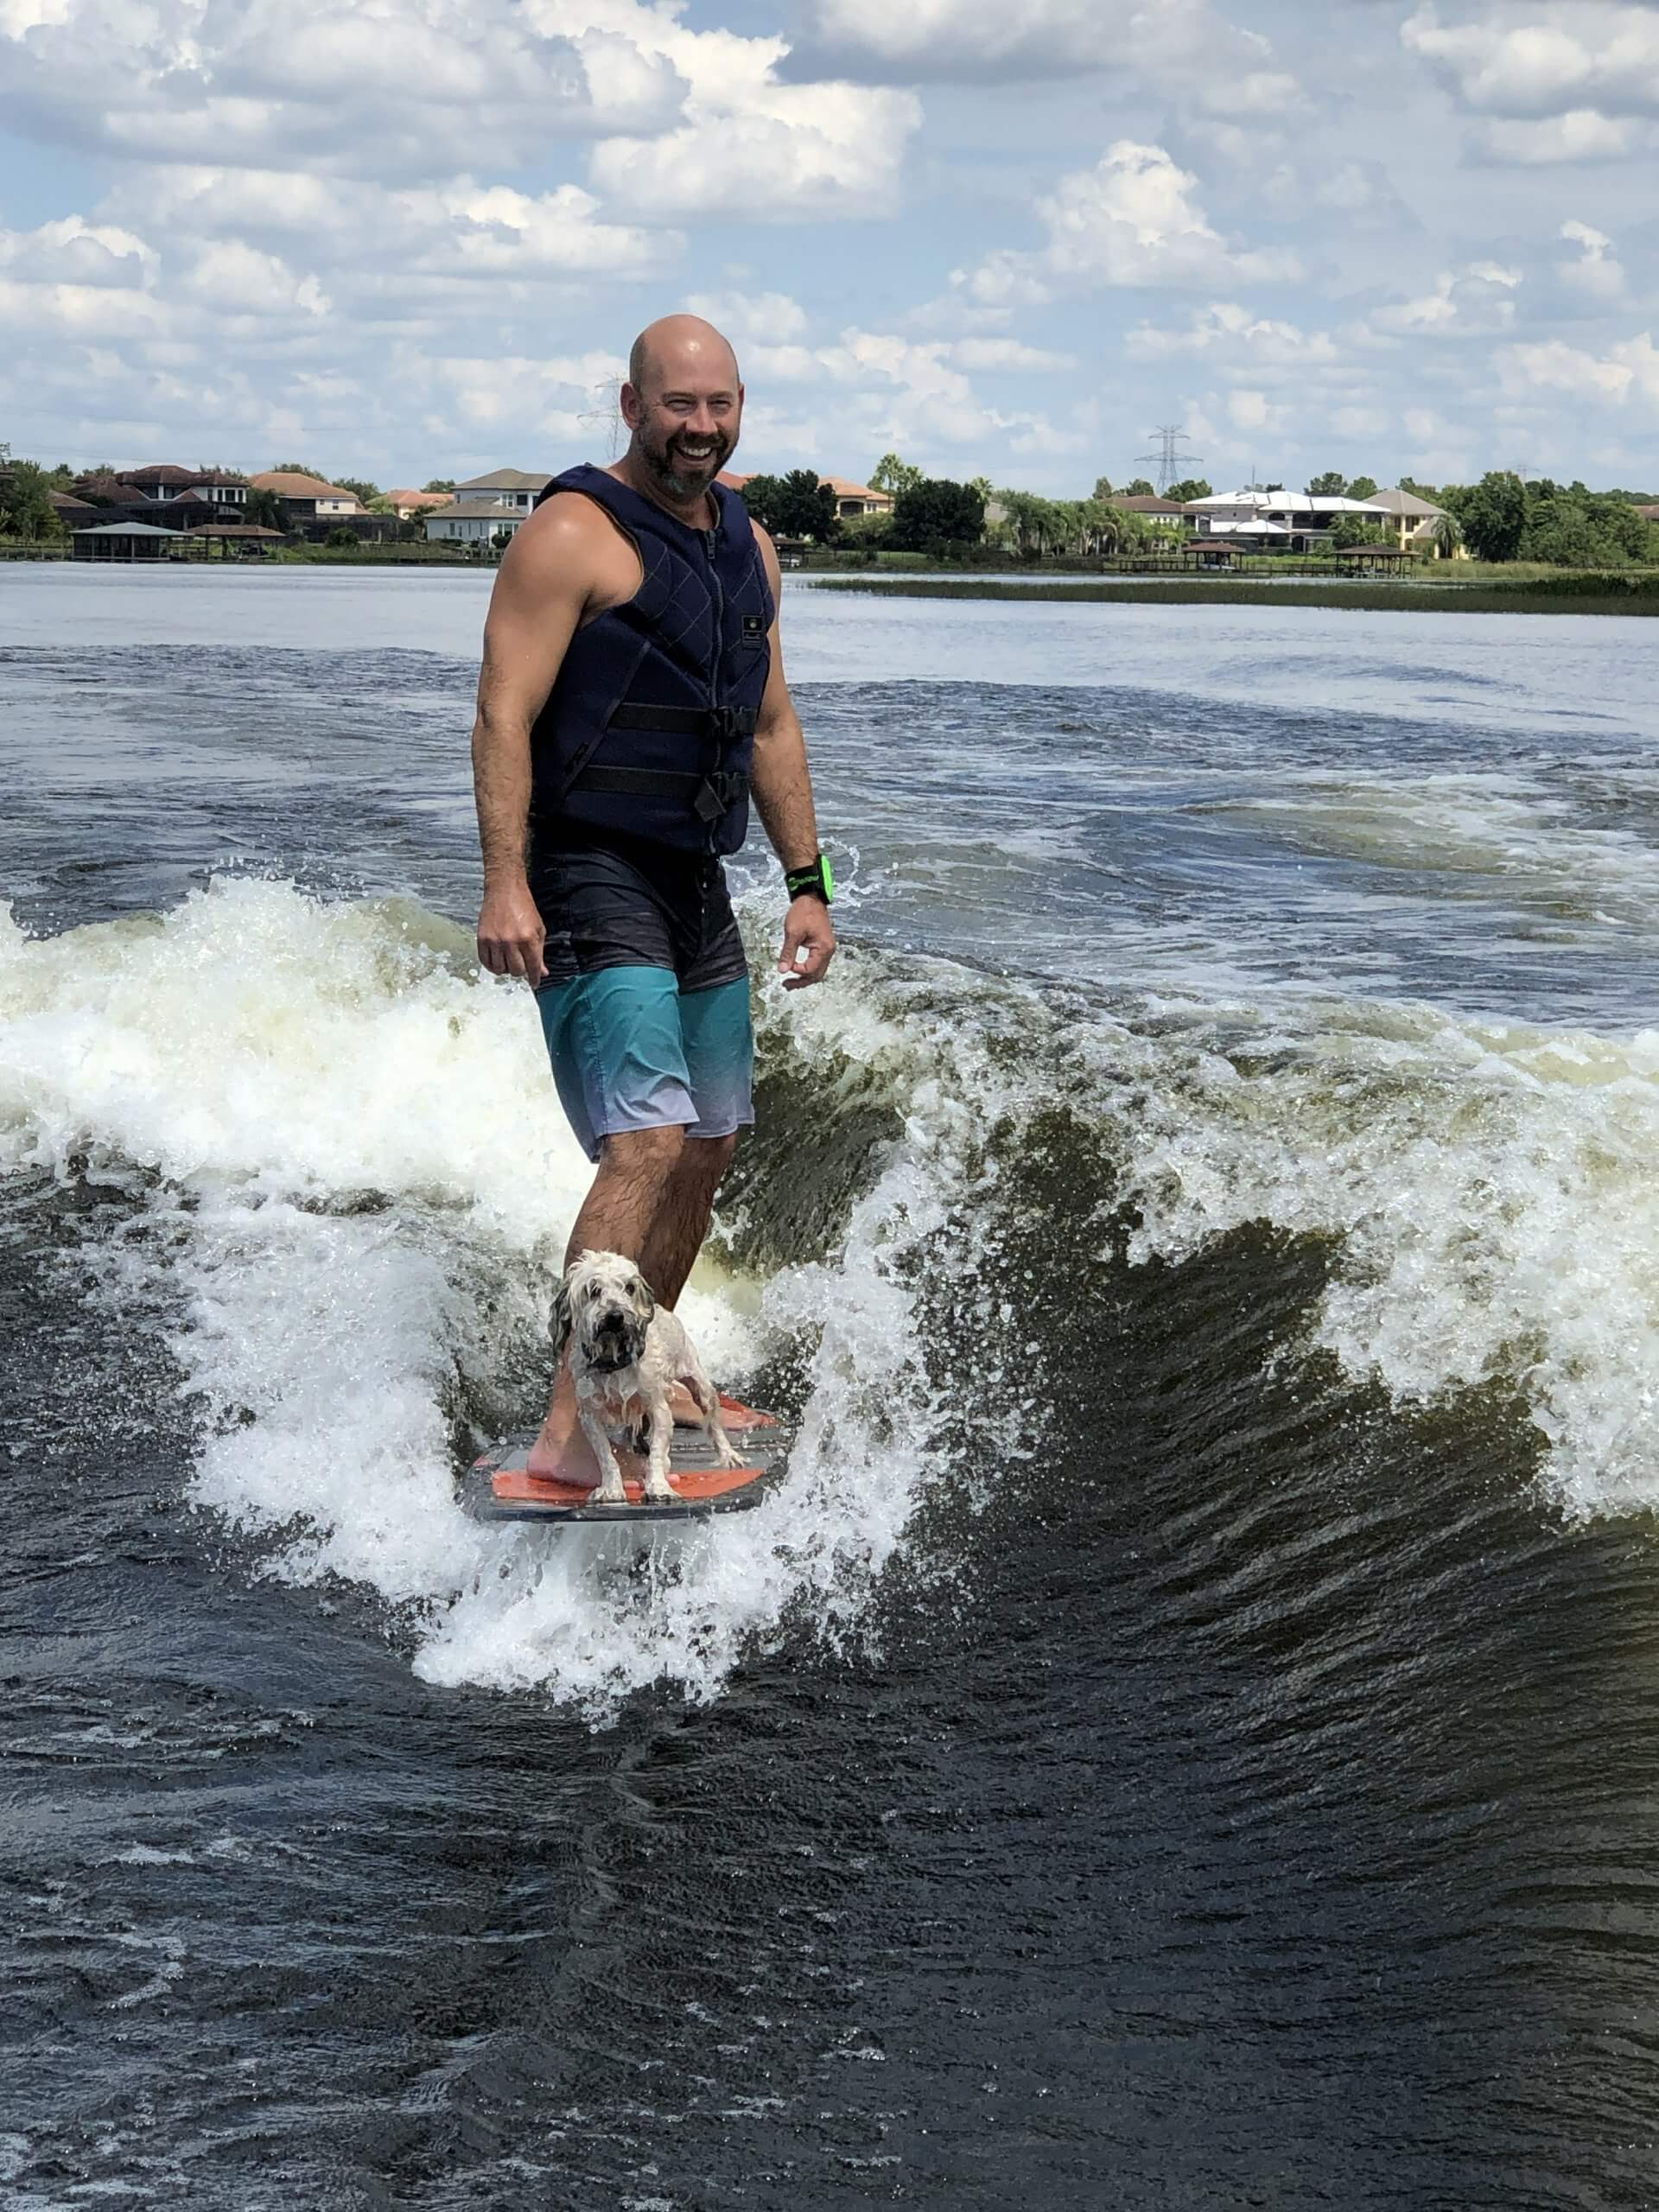 thor surfing